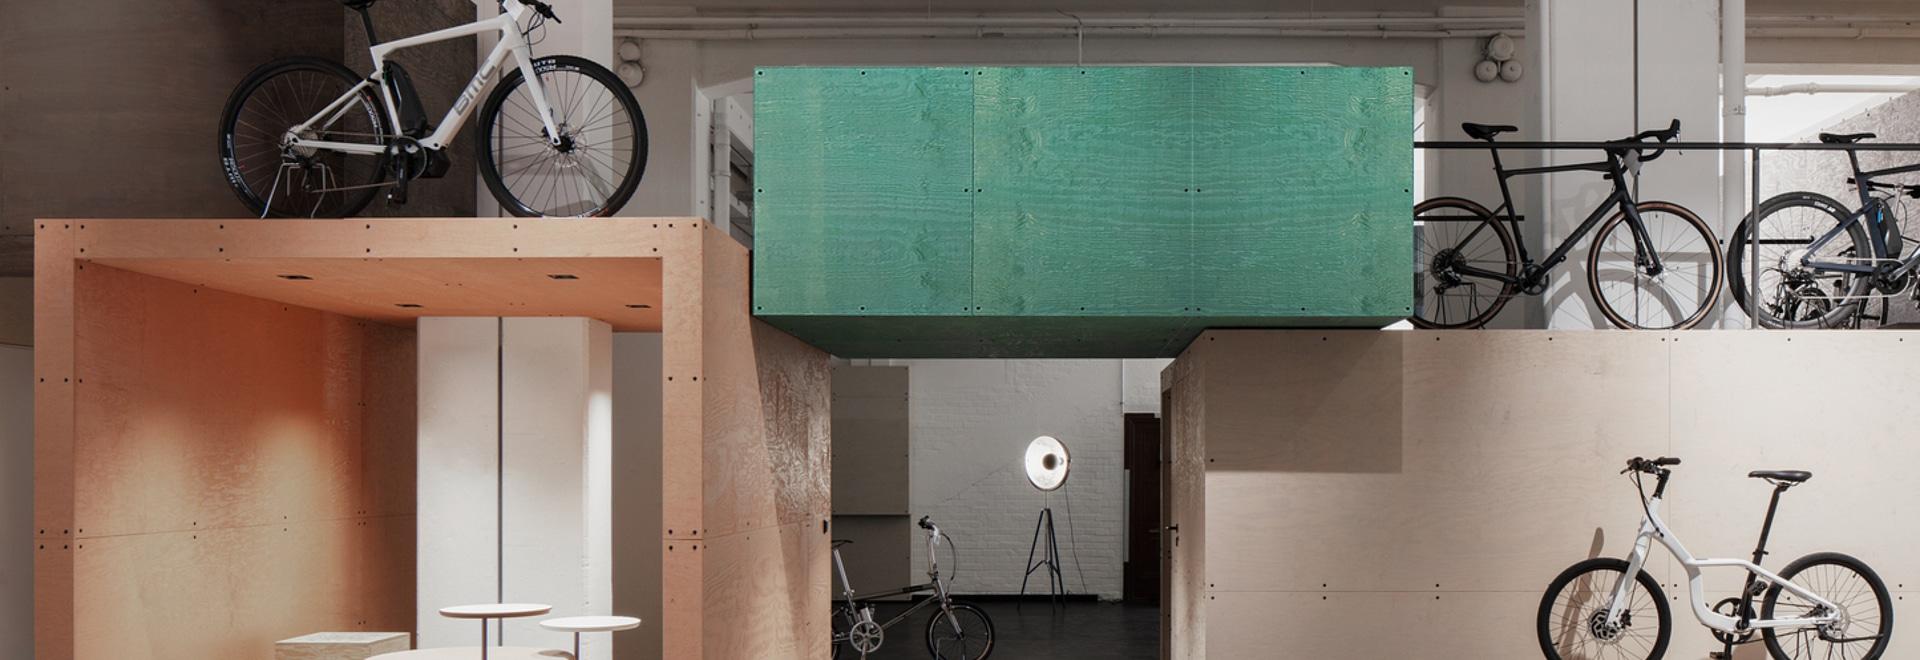 Bureaux WALL.BOX / NAICE architecture & design